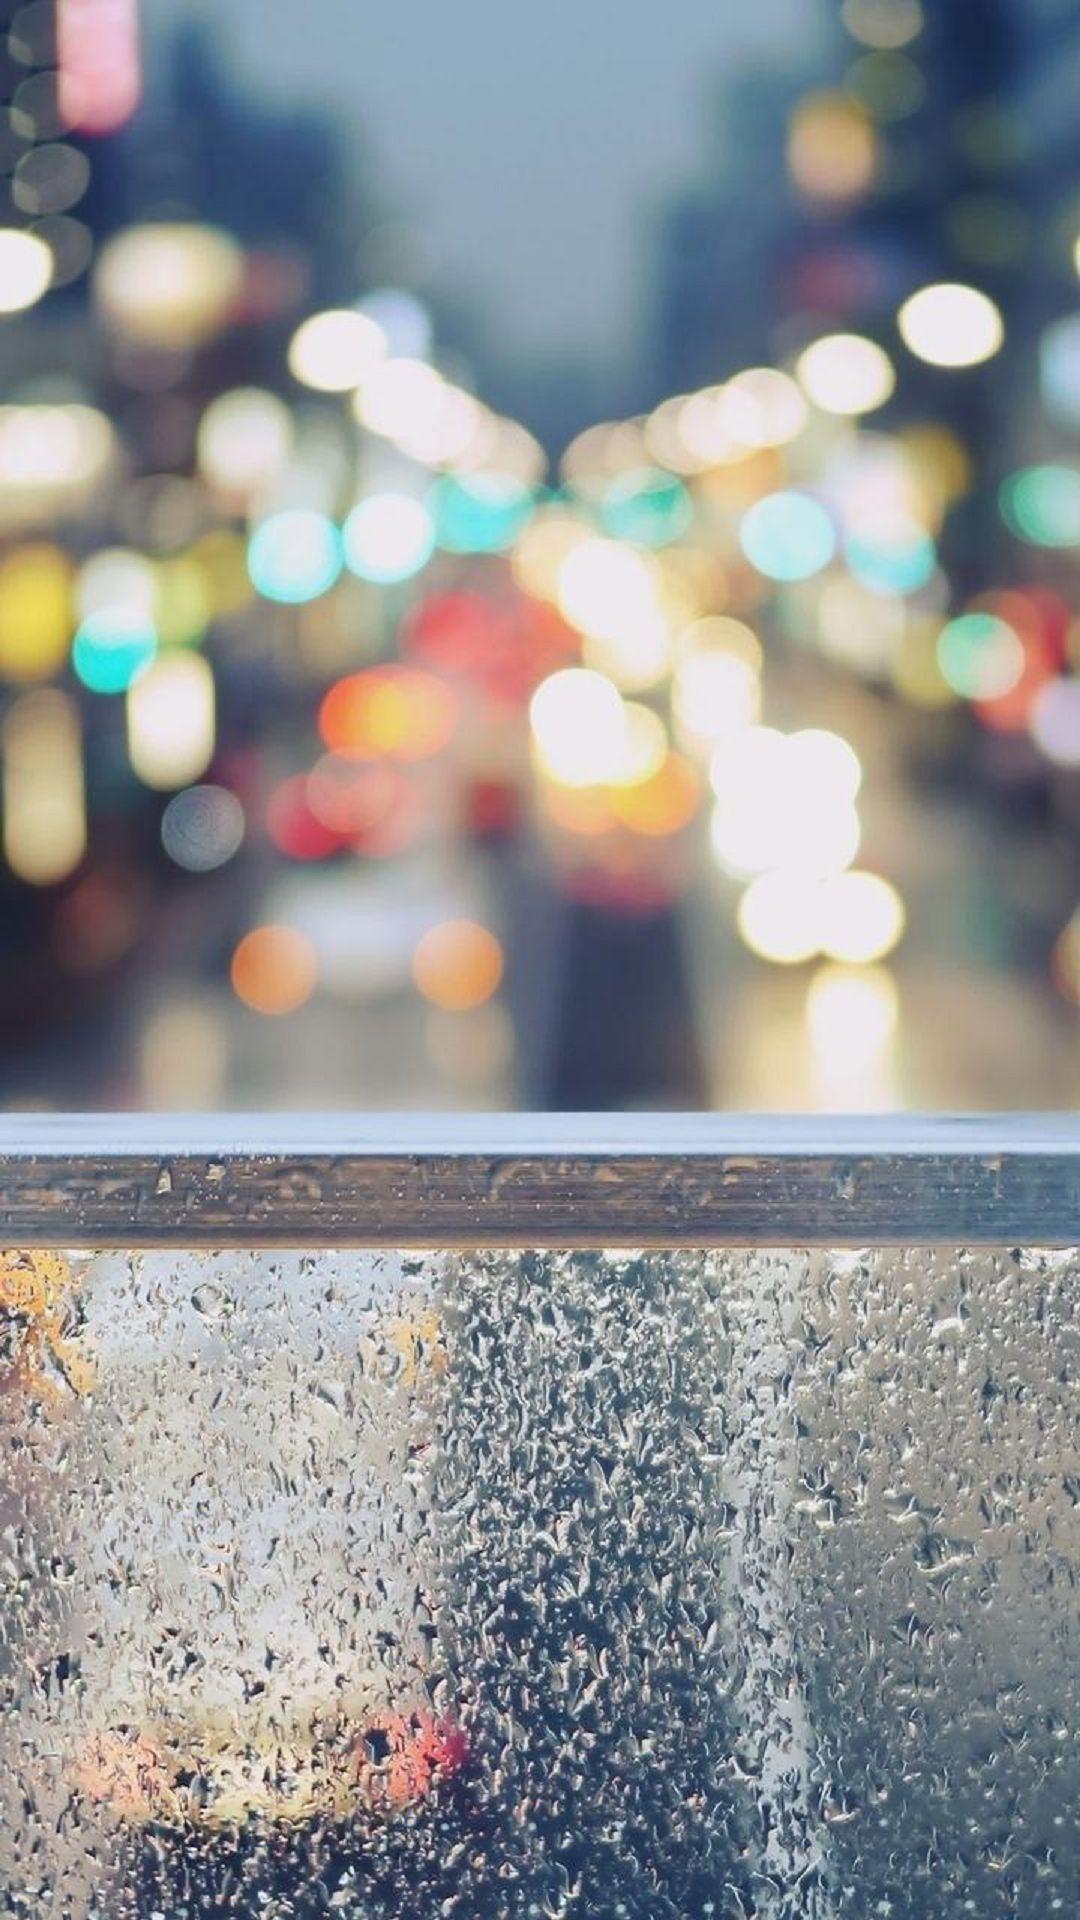 Rain Wallpaper Iphone 4s Rain Wallpapers Bokeh Lights